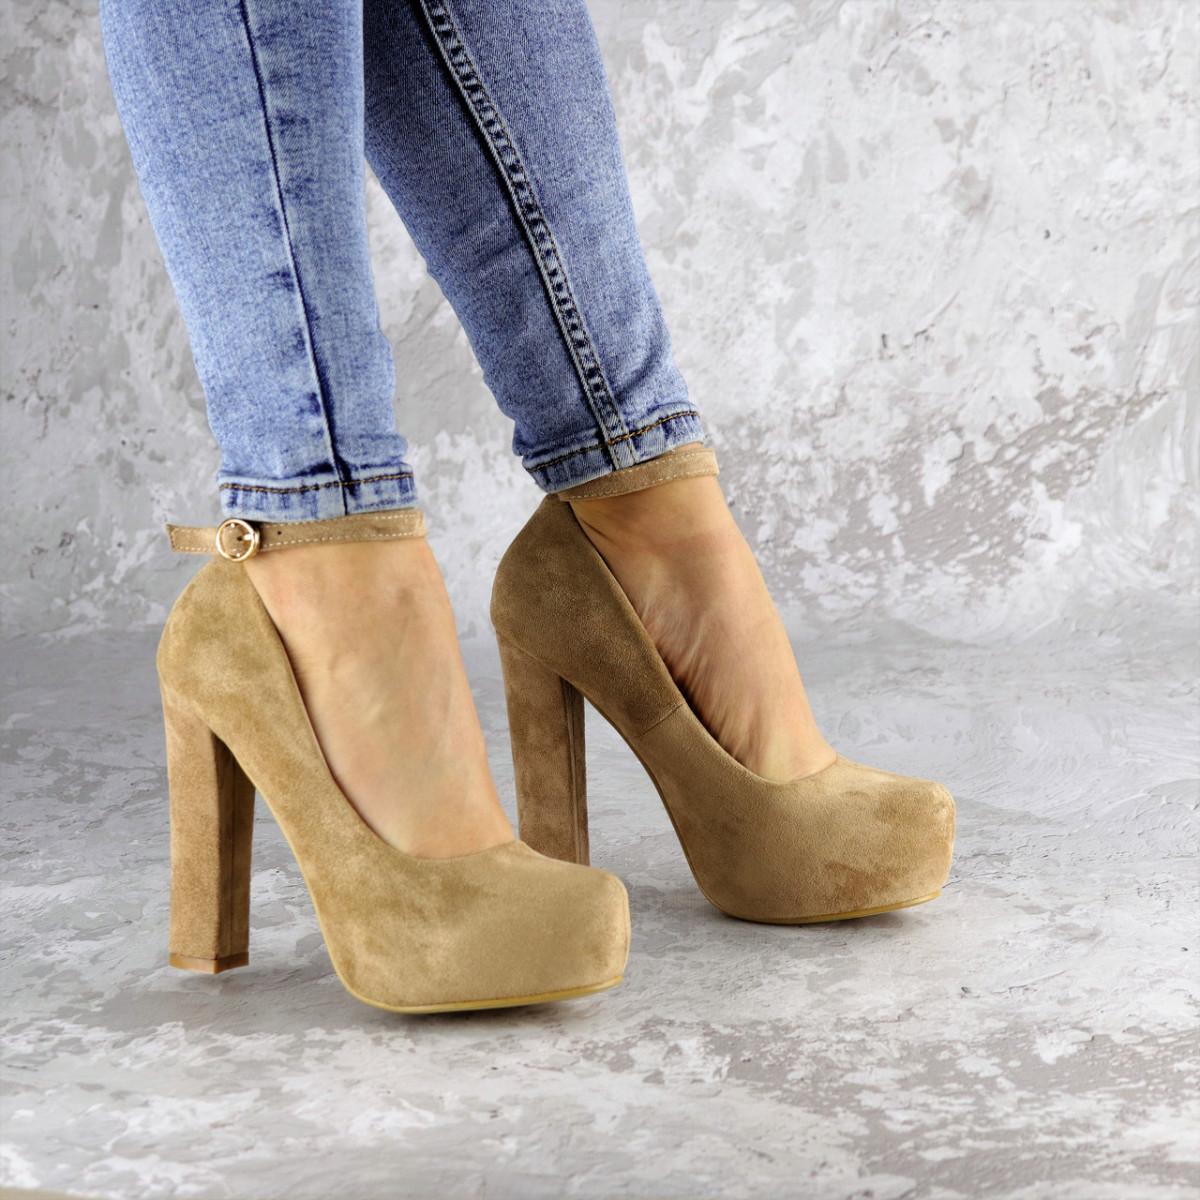 Туфли женские Rich бежевые на каблуках 1241 (38 размер)